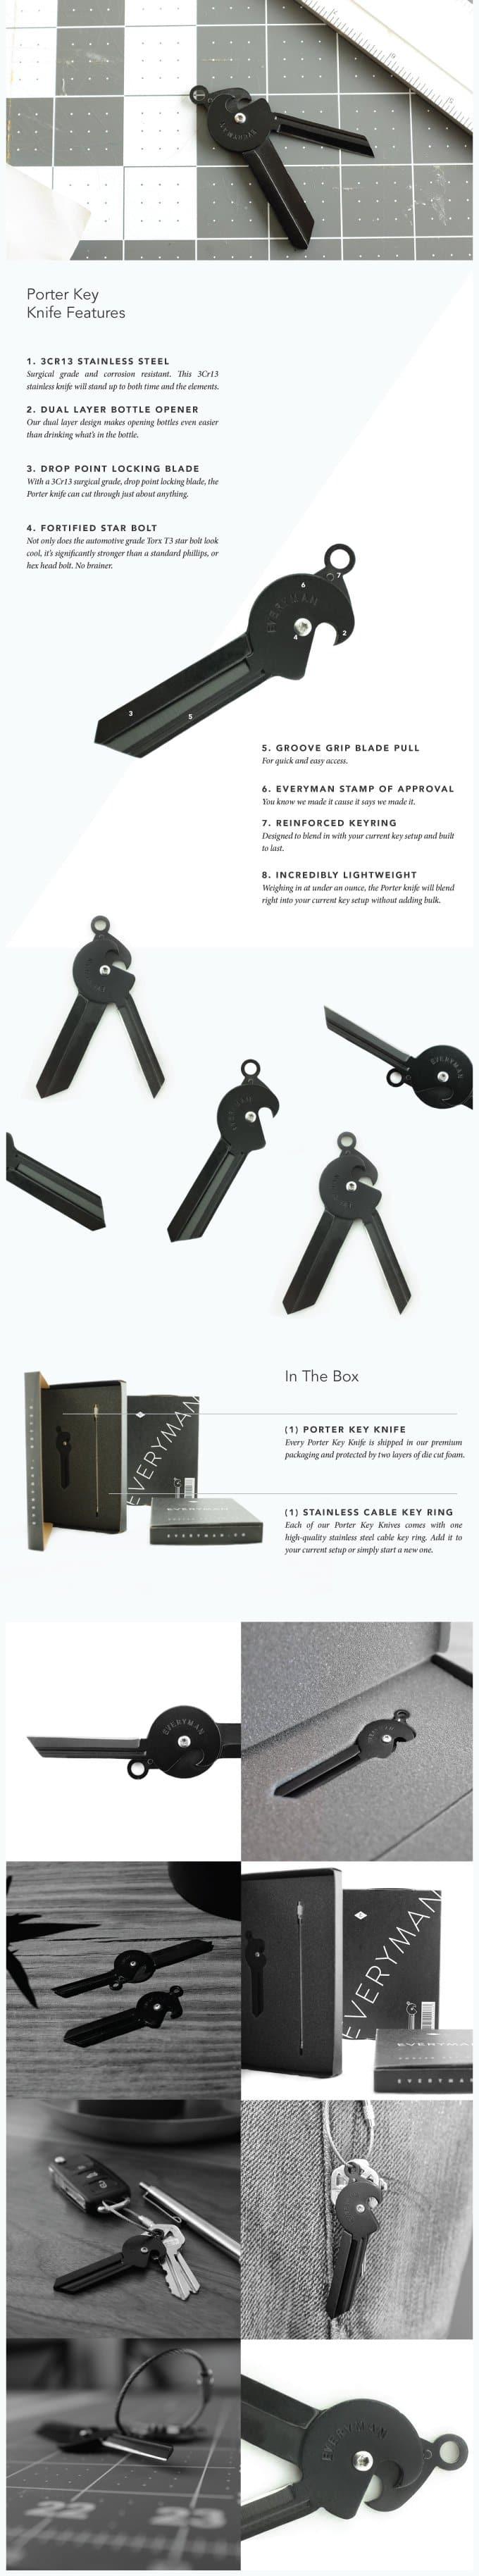 Porter Key Knife